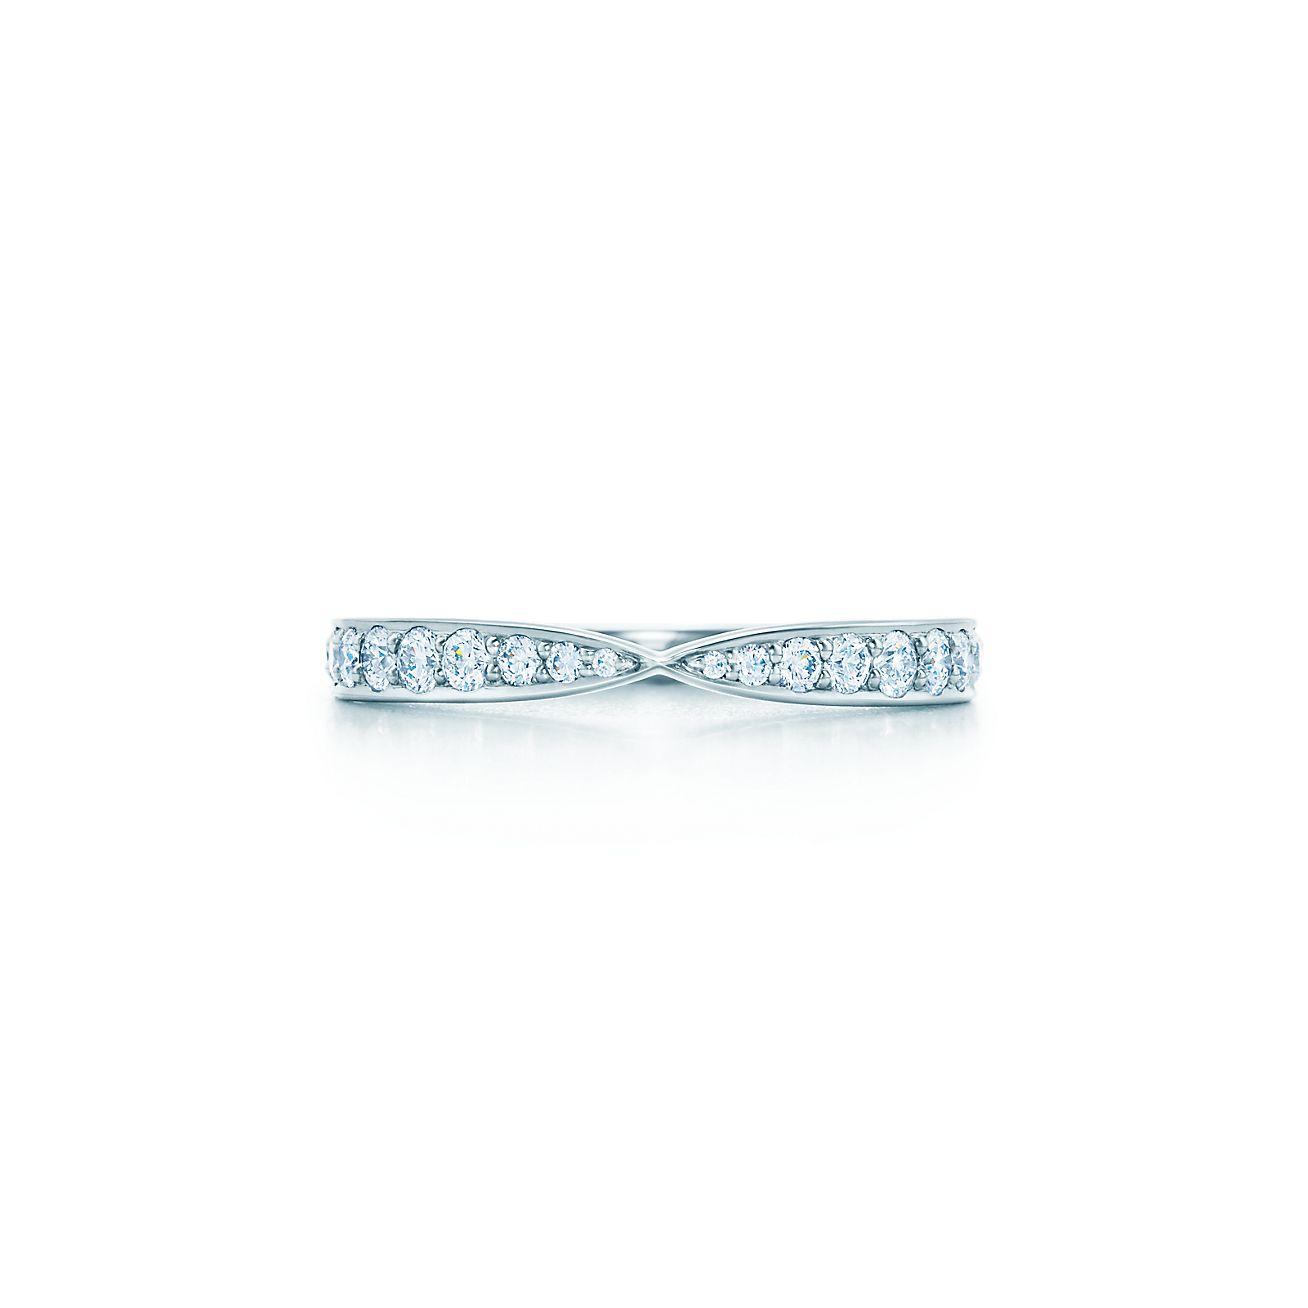 Tiffany Harmony ring in platinum with beadset diamonds